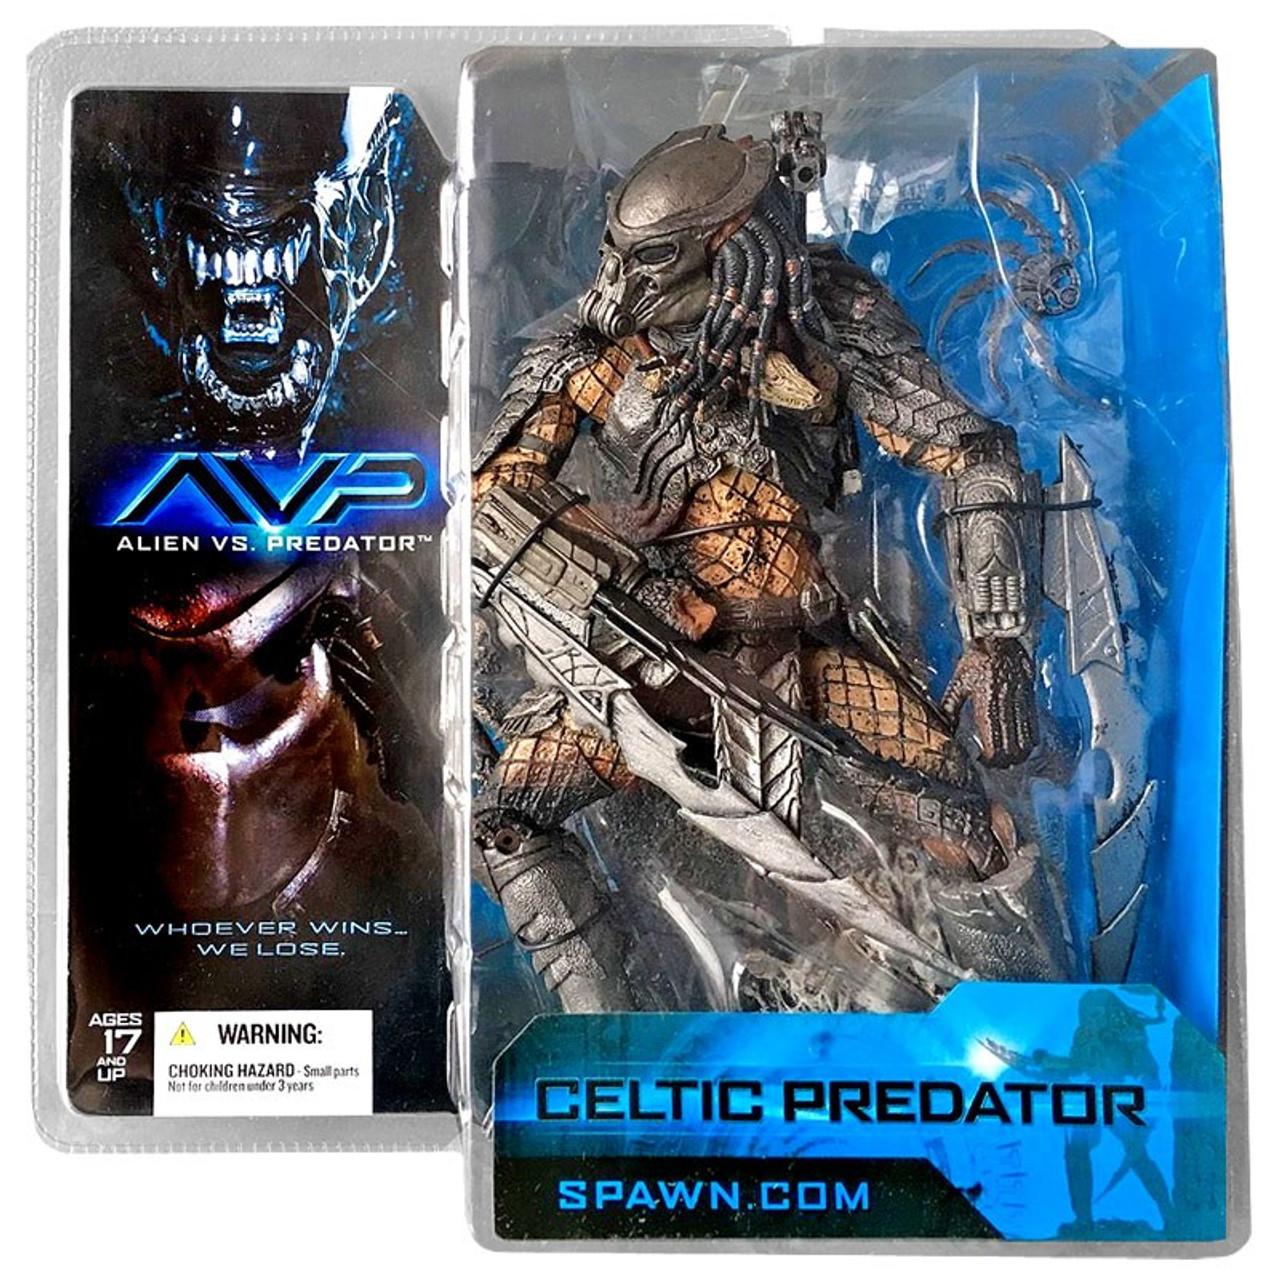 McFarlane Toys Alien vs Predator Alien vs. Predator Movie Celtic Predator Action Figure